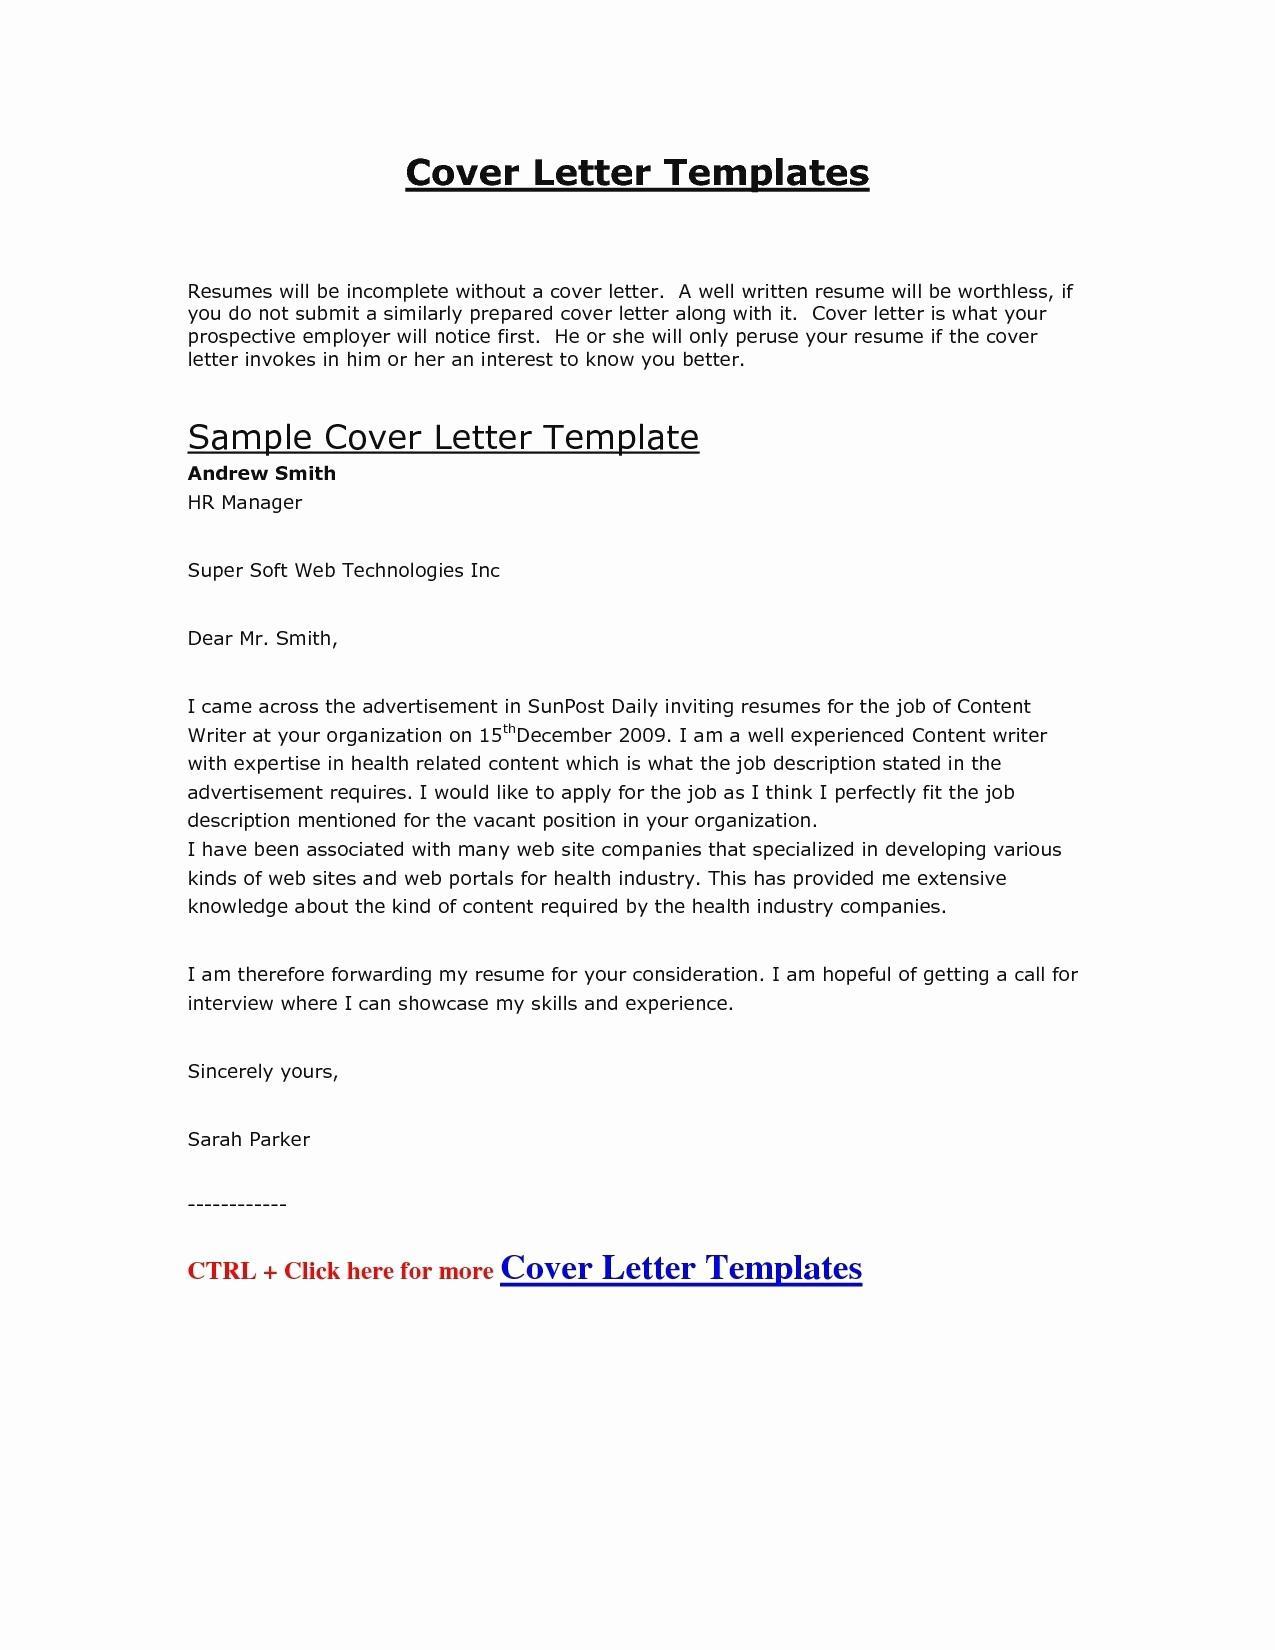 Child Custody Letter Template - Resume Templates Poppycockreviews